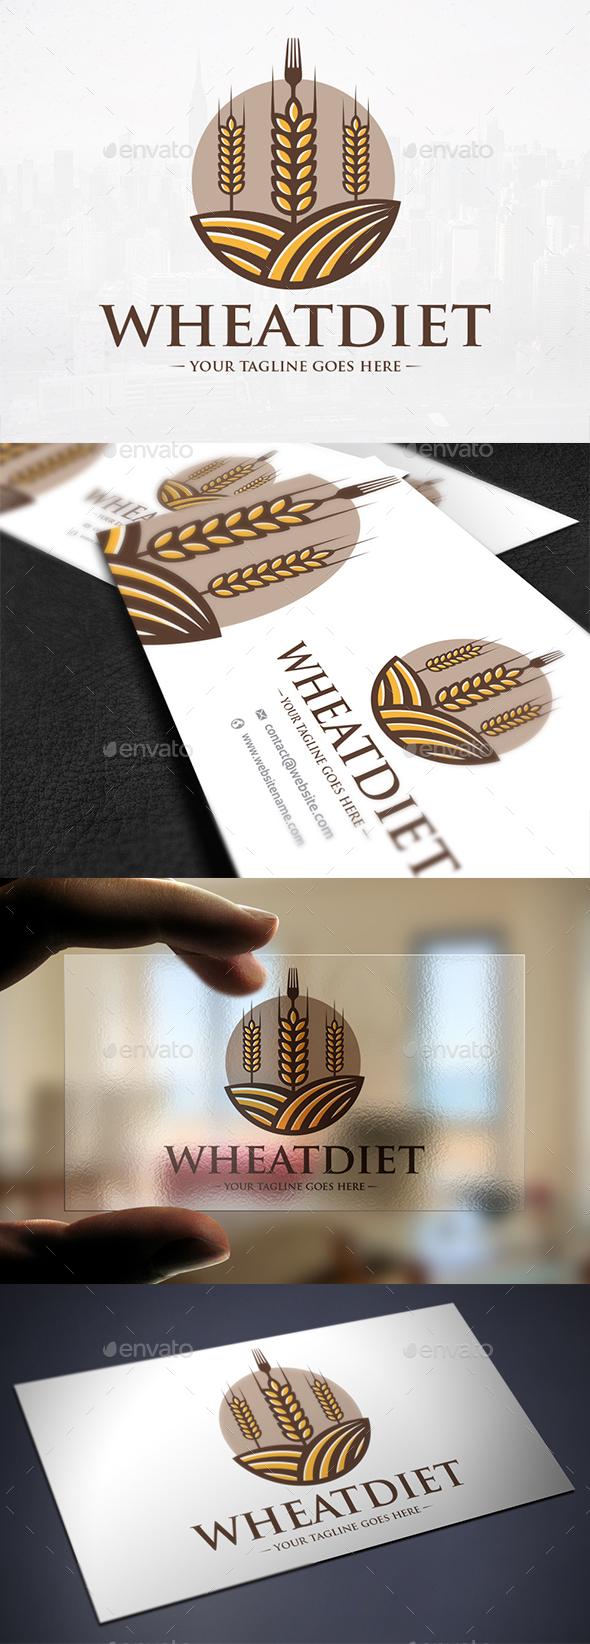 Wheat Diet Logo Template - Nature Logo Templates